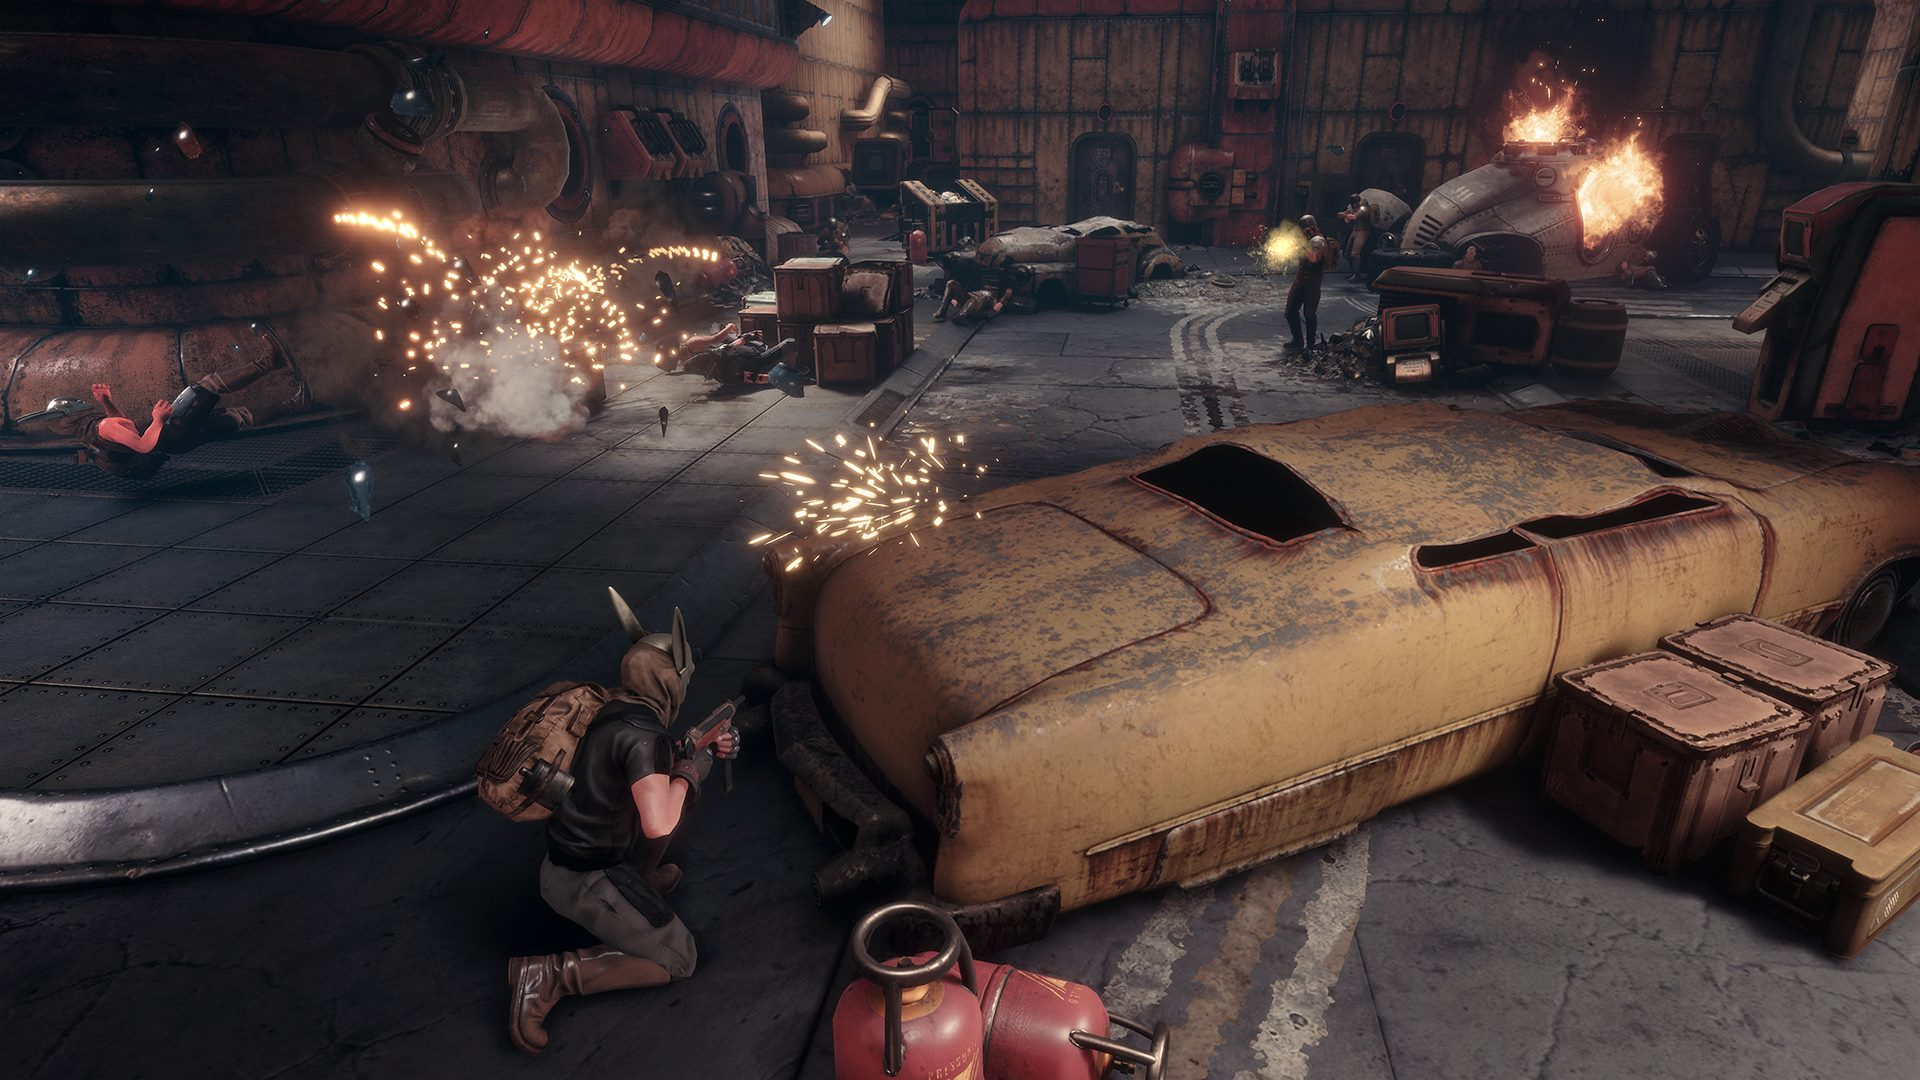 Insomnia: The Ark Screenshot 3 - Bilderquelle: HeroCraft